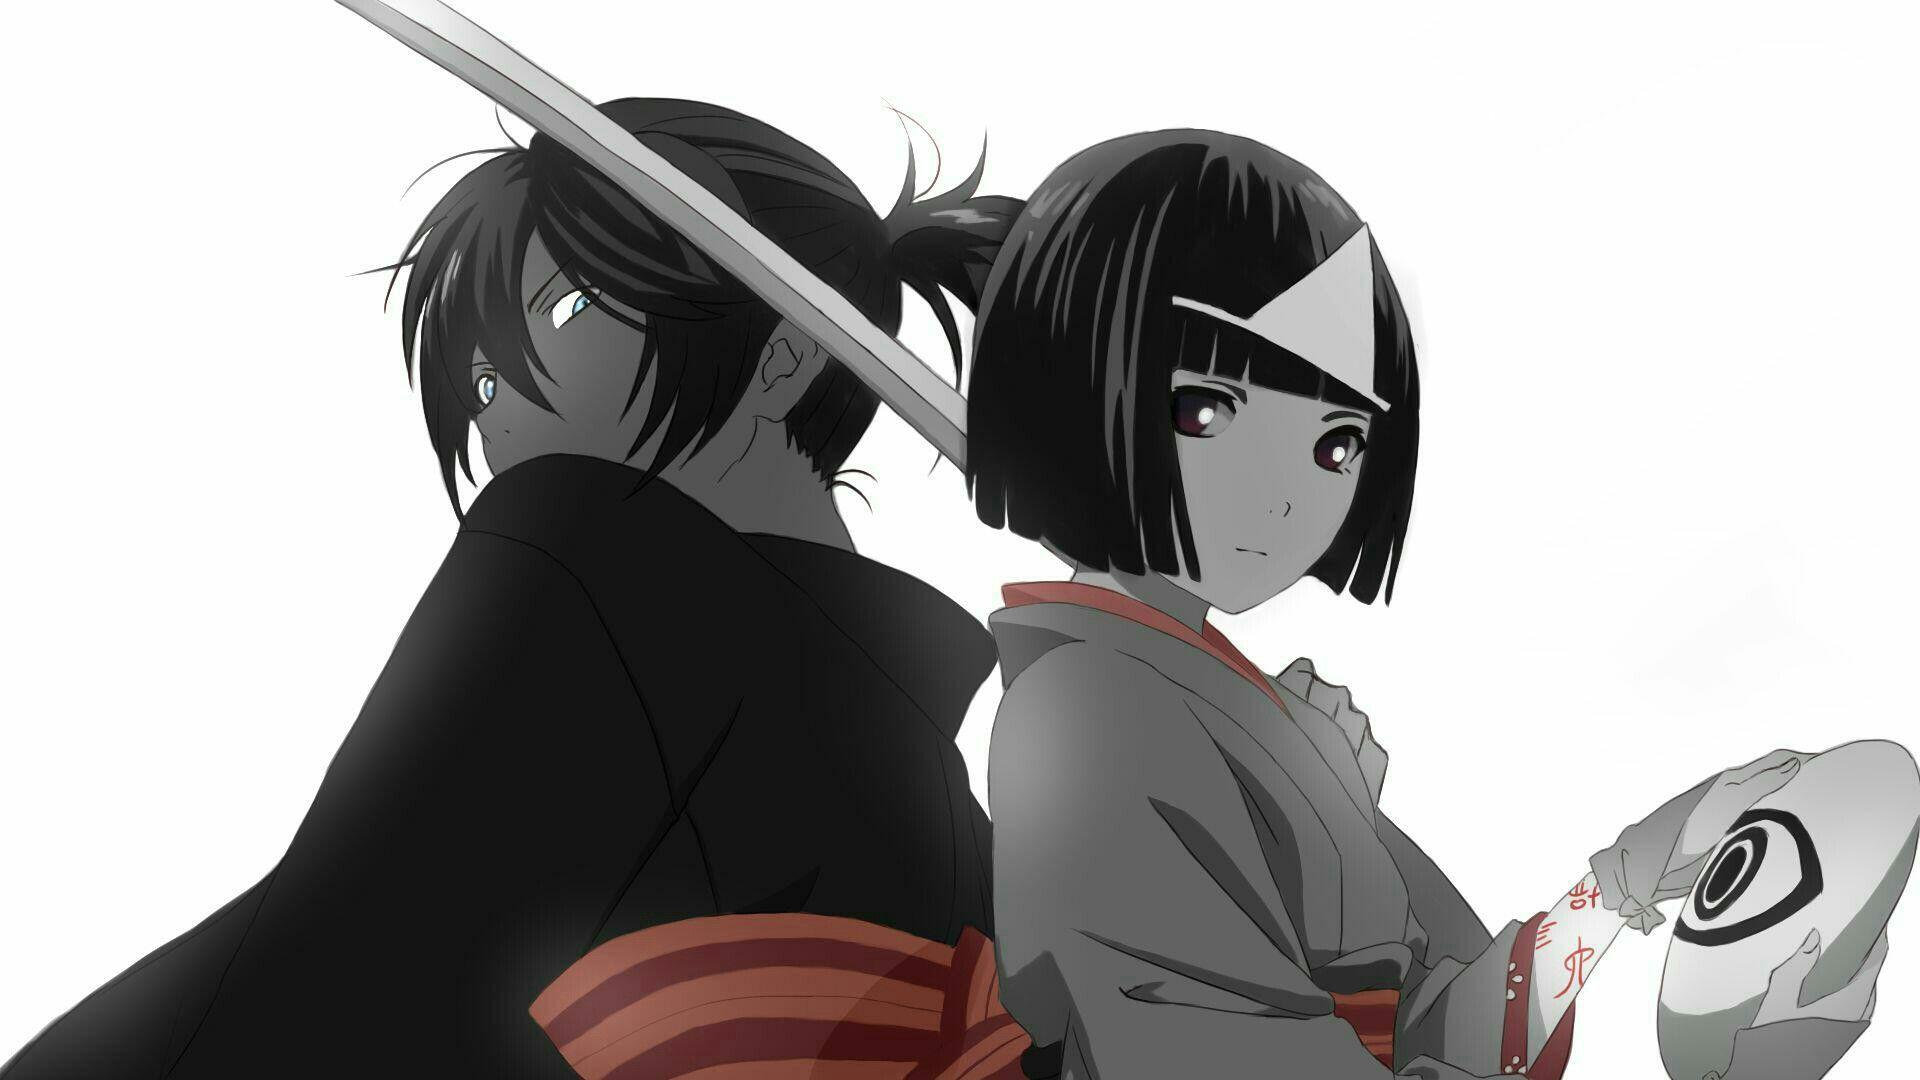 Pin by Alnime Kurona on Noragami Noragami anime